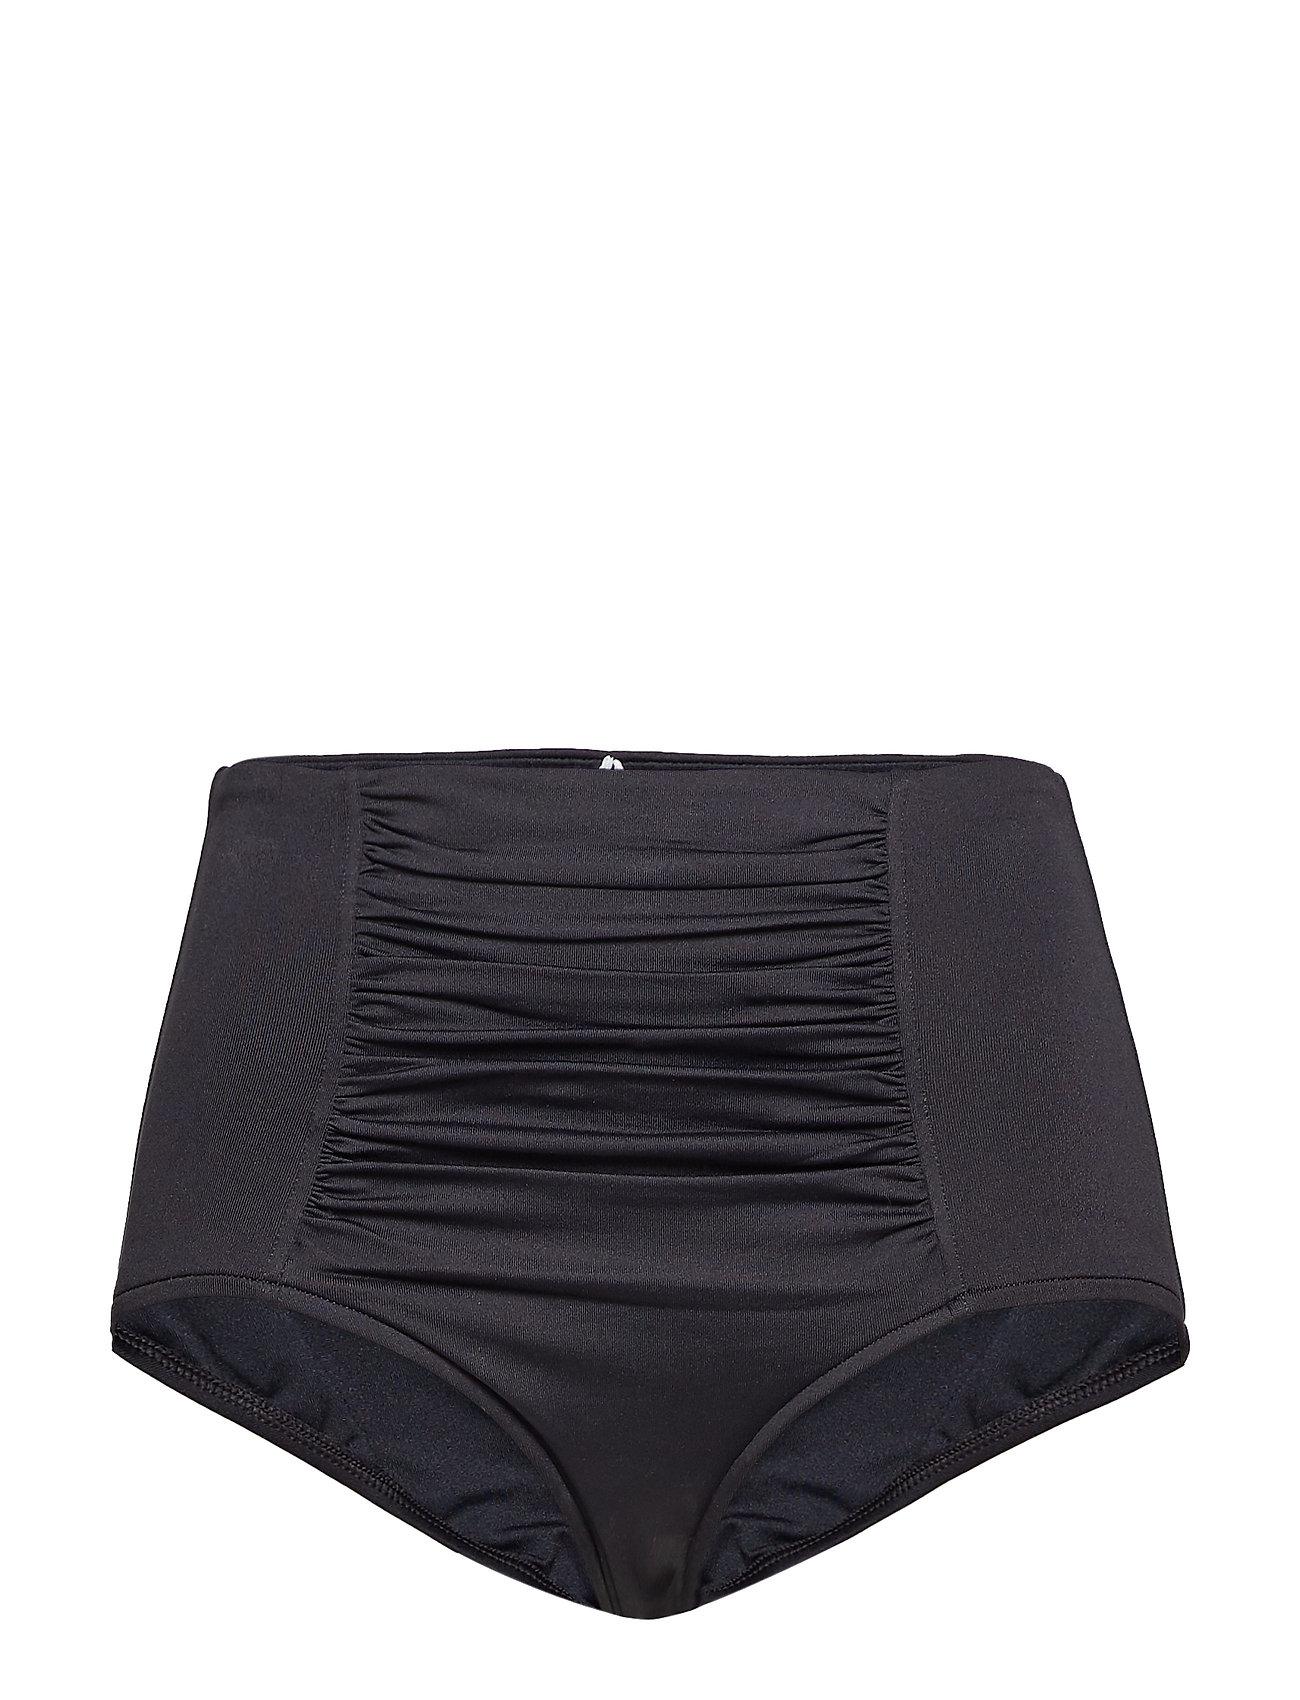 Seafolly High Waisted Pant - BLACK